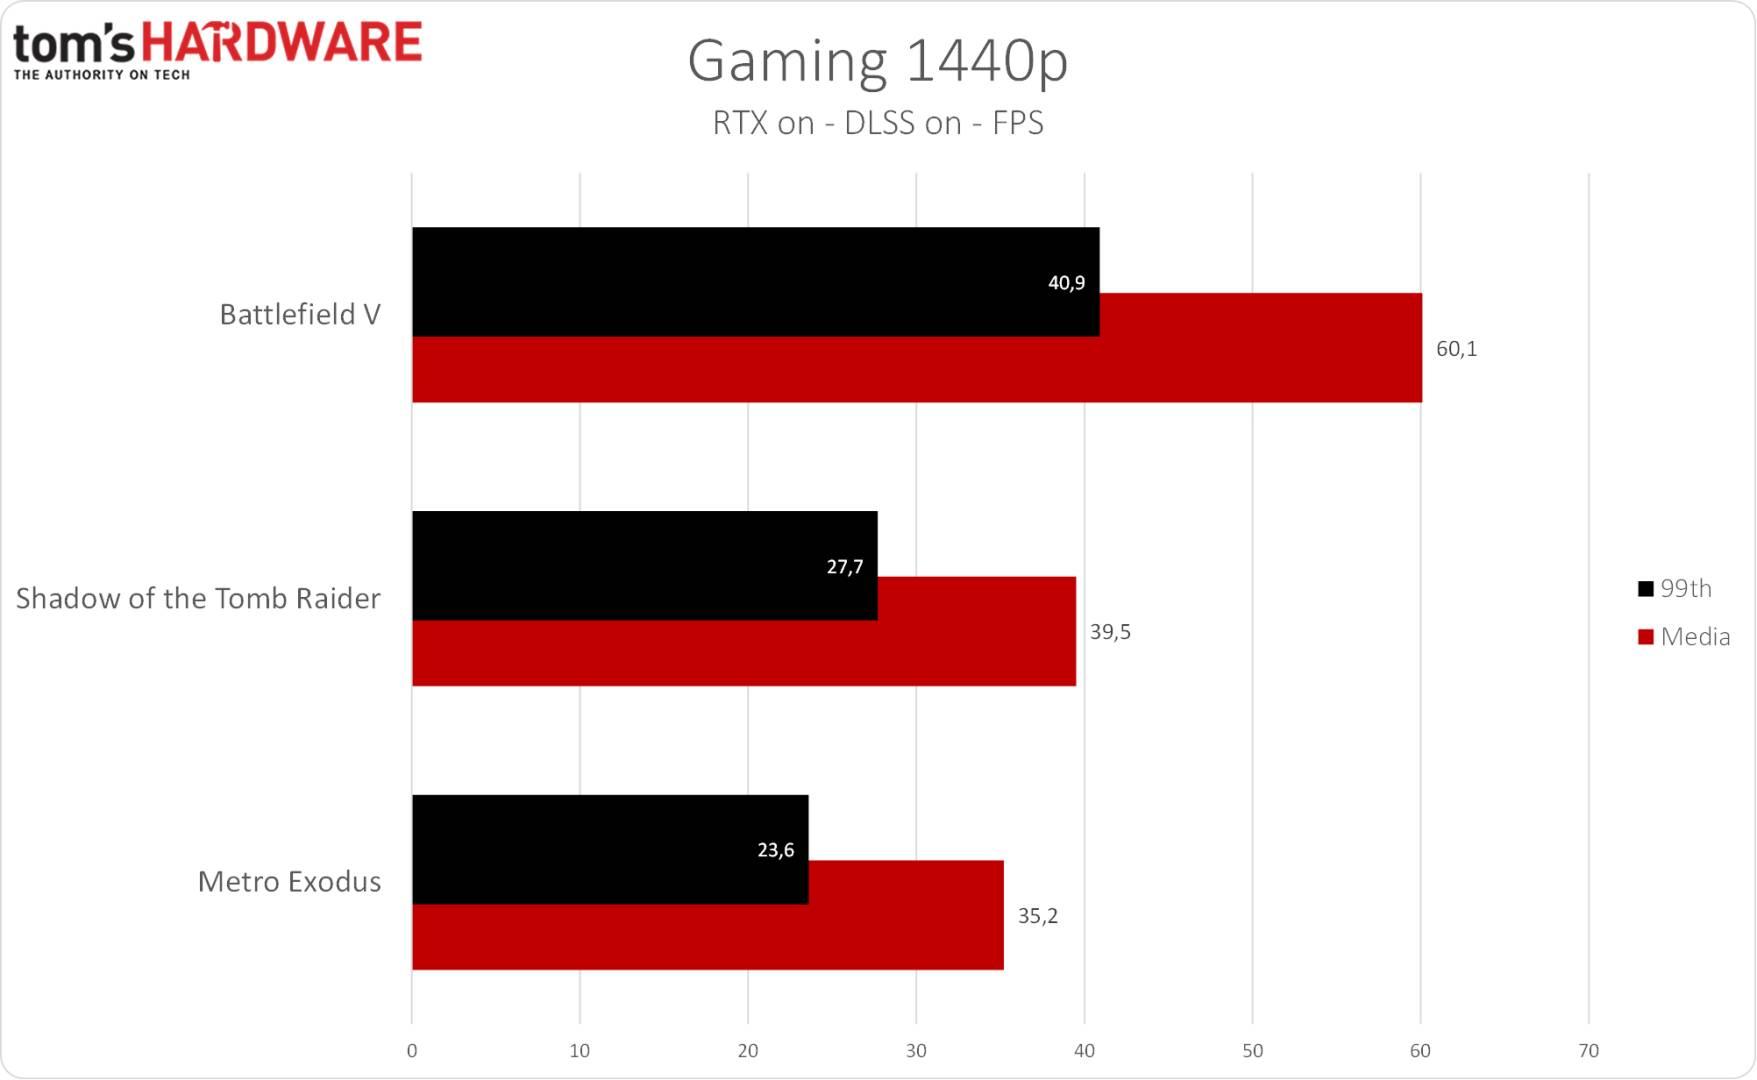 Eurocom Nightsky RX15 - Gaming 1440p RTX DLSS